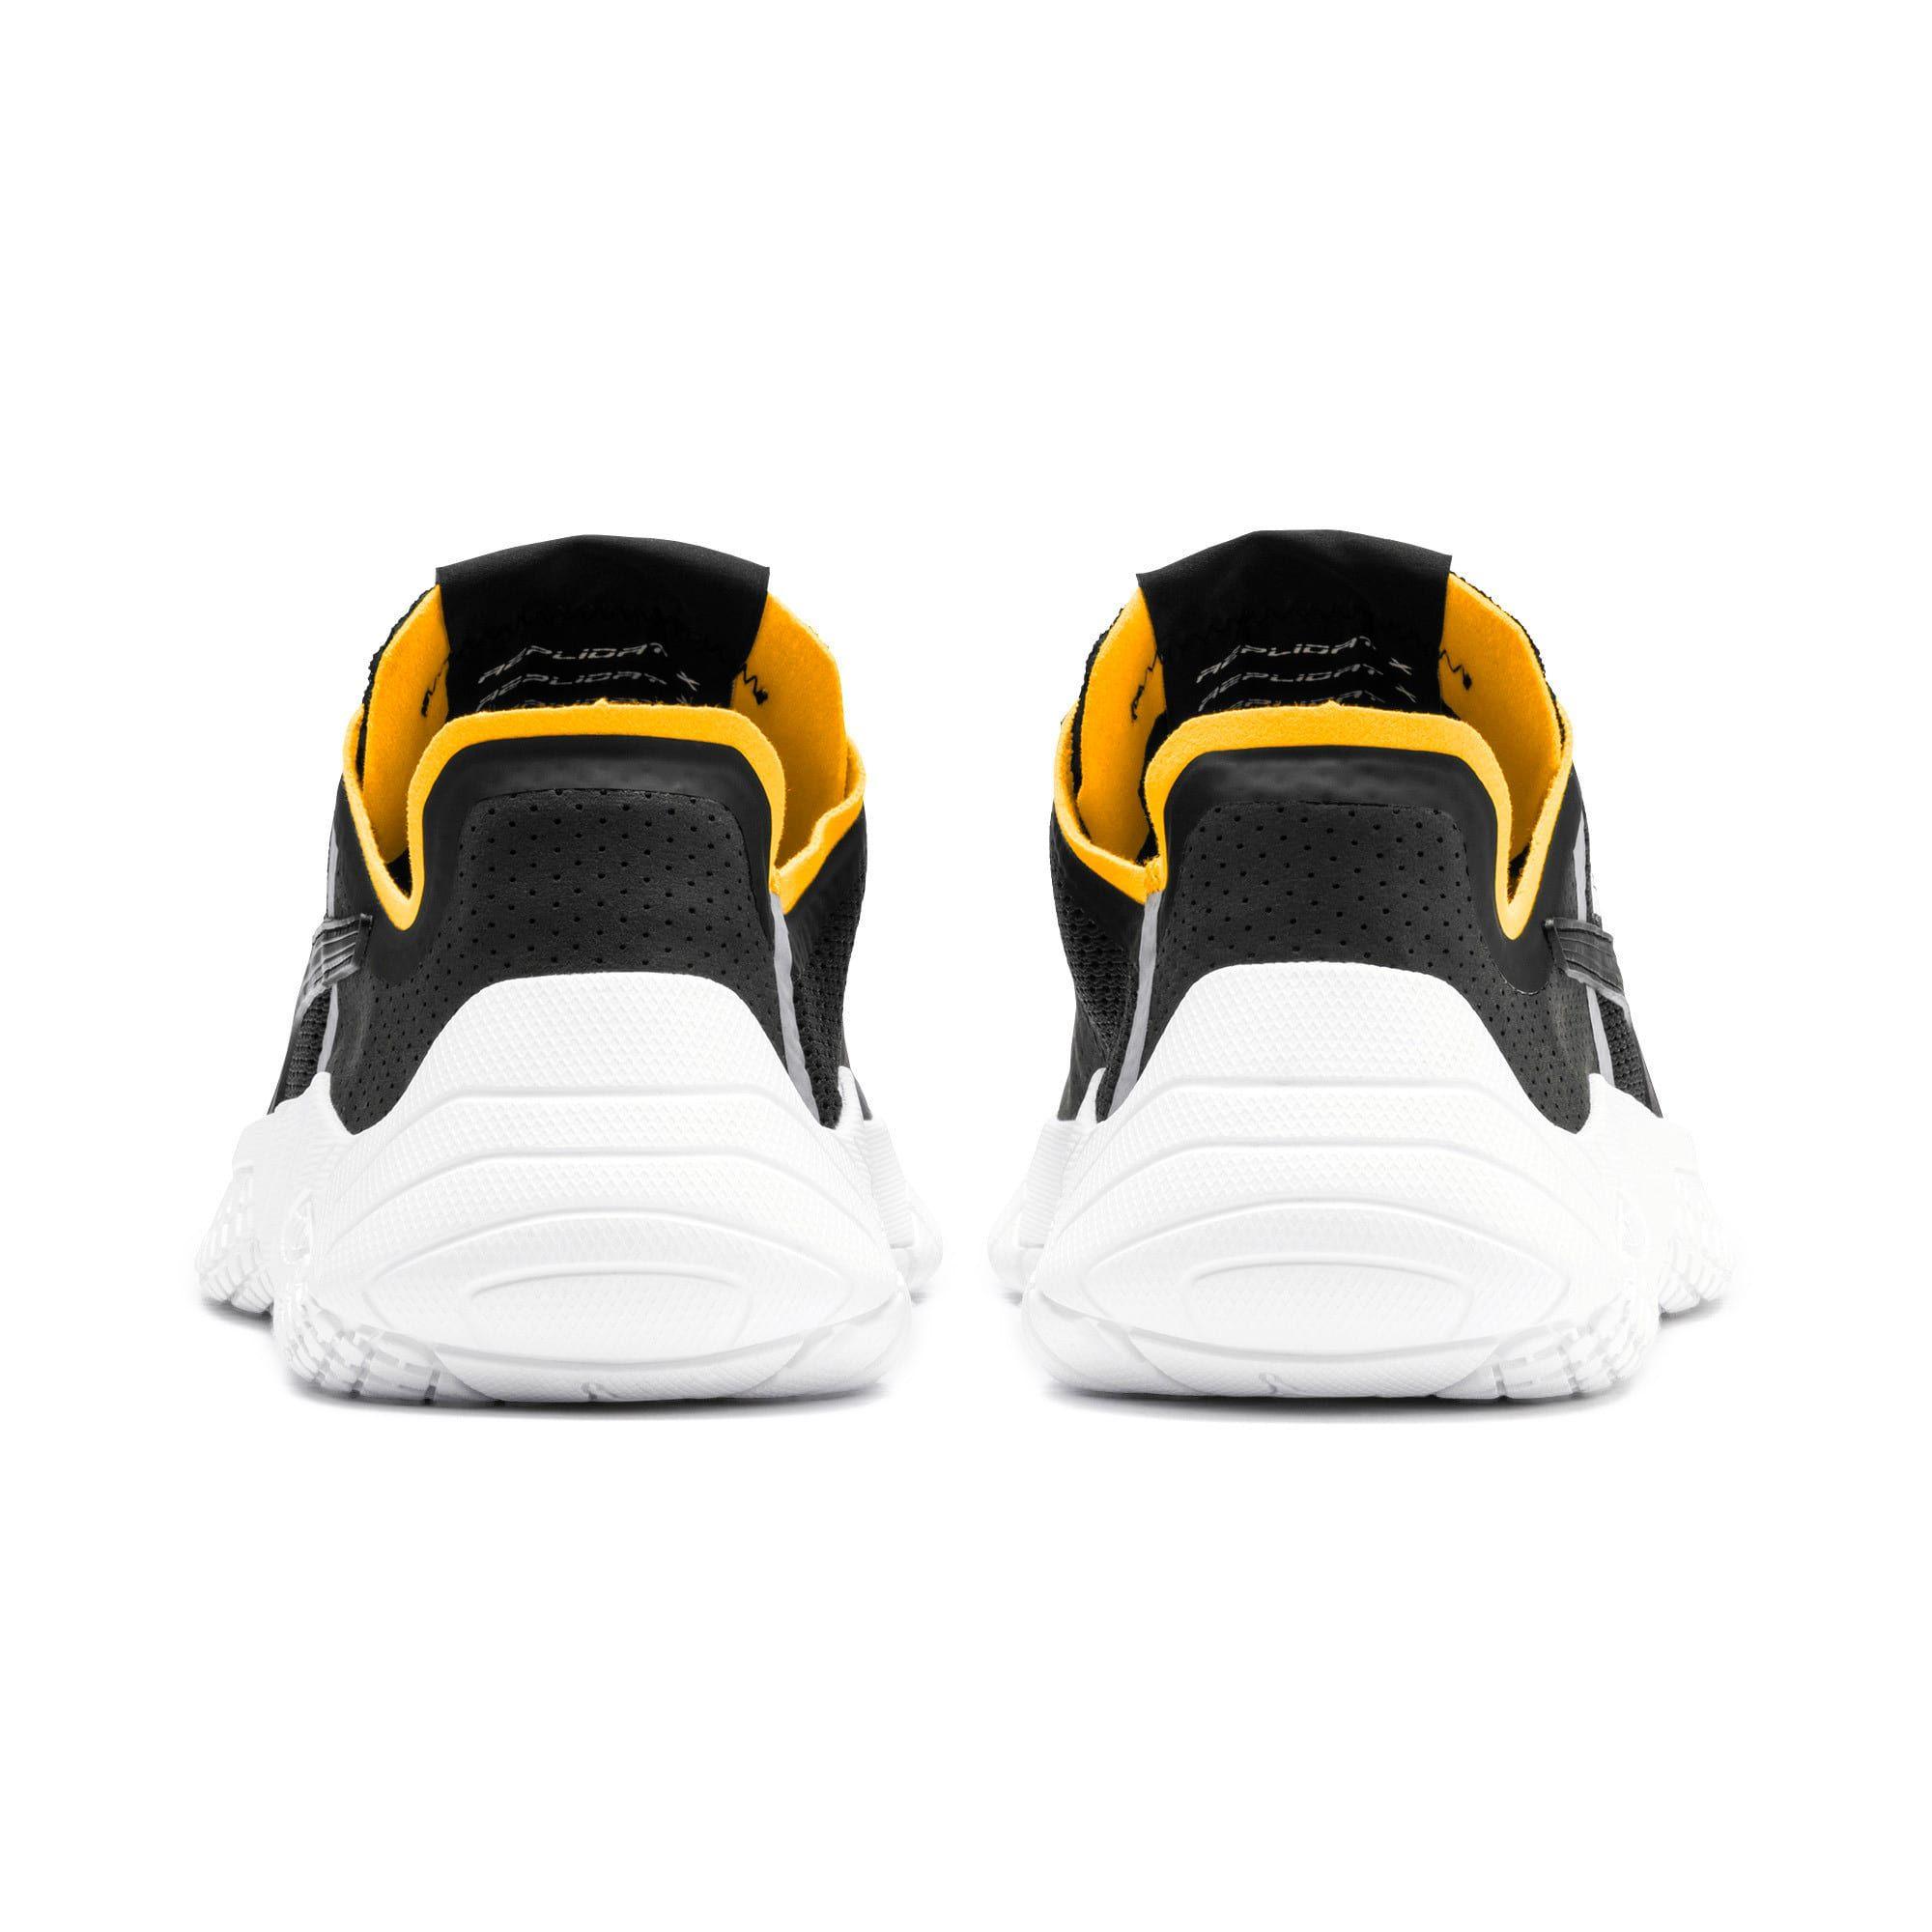 Photo of PUMA Pirelli Replicat-X Trainers,  Black/White/Zinnia, size 6.5, Shoes